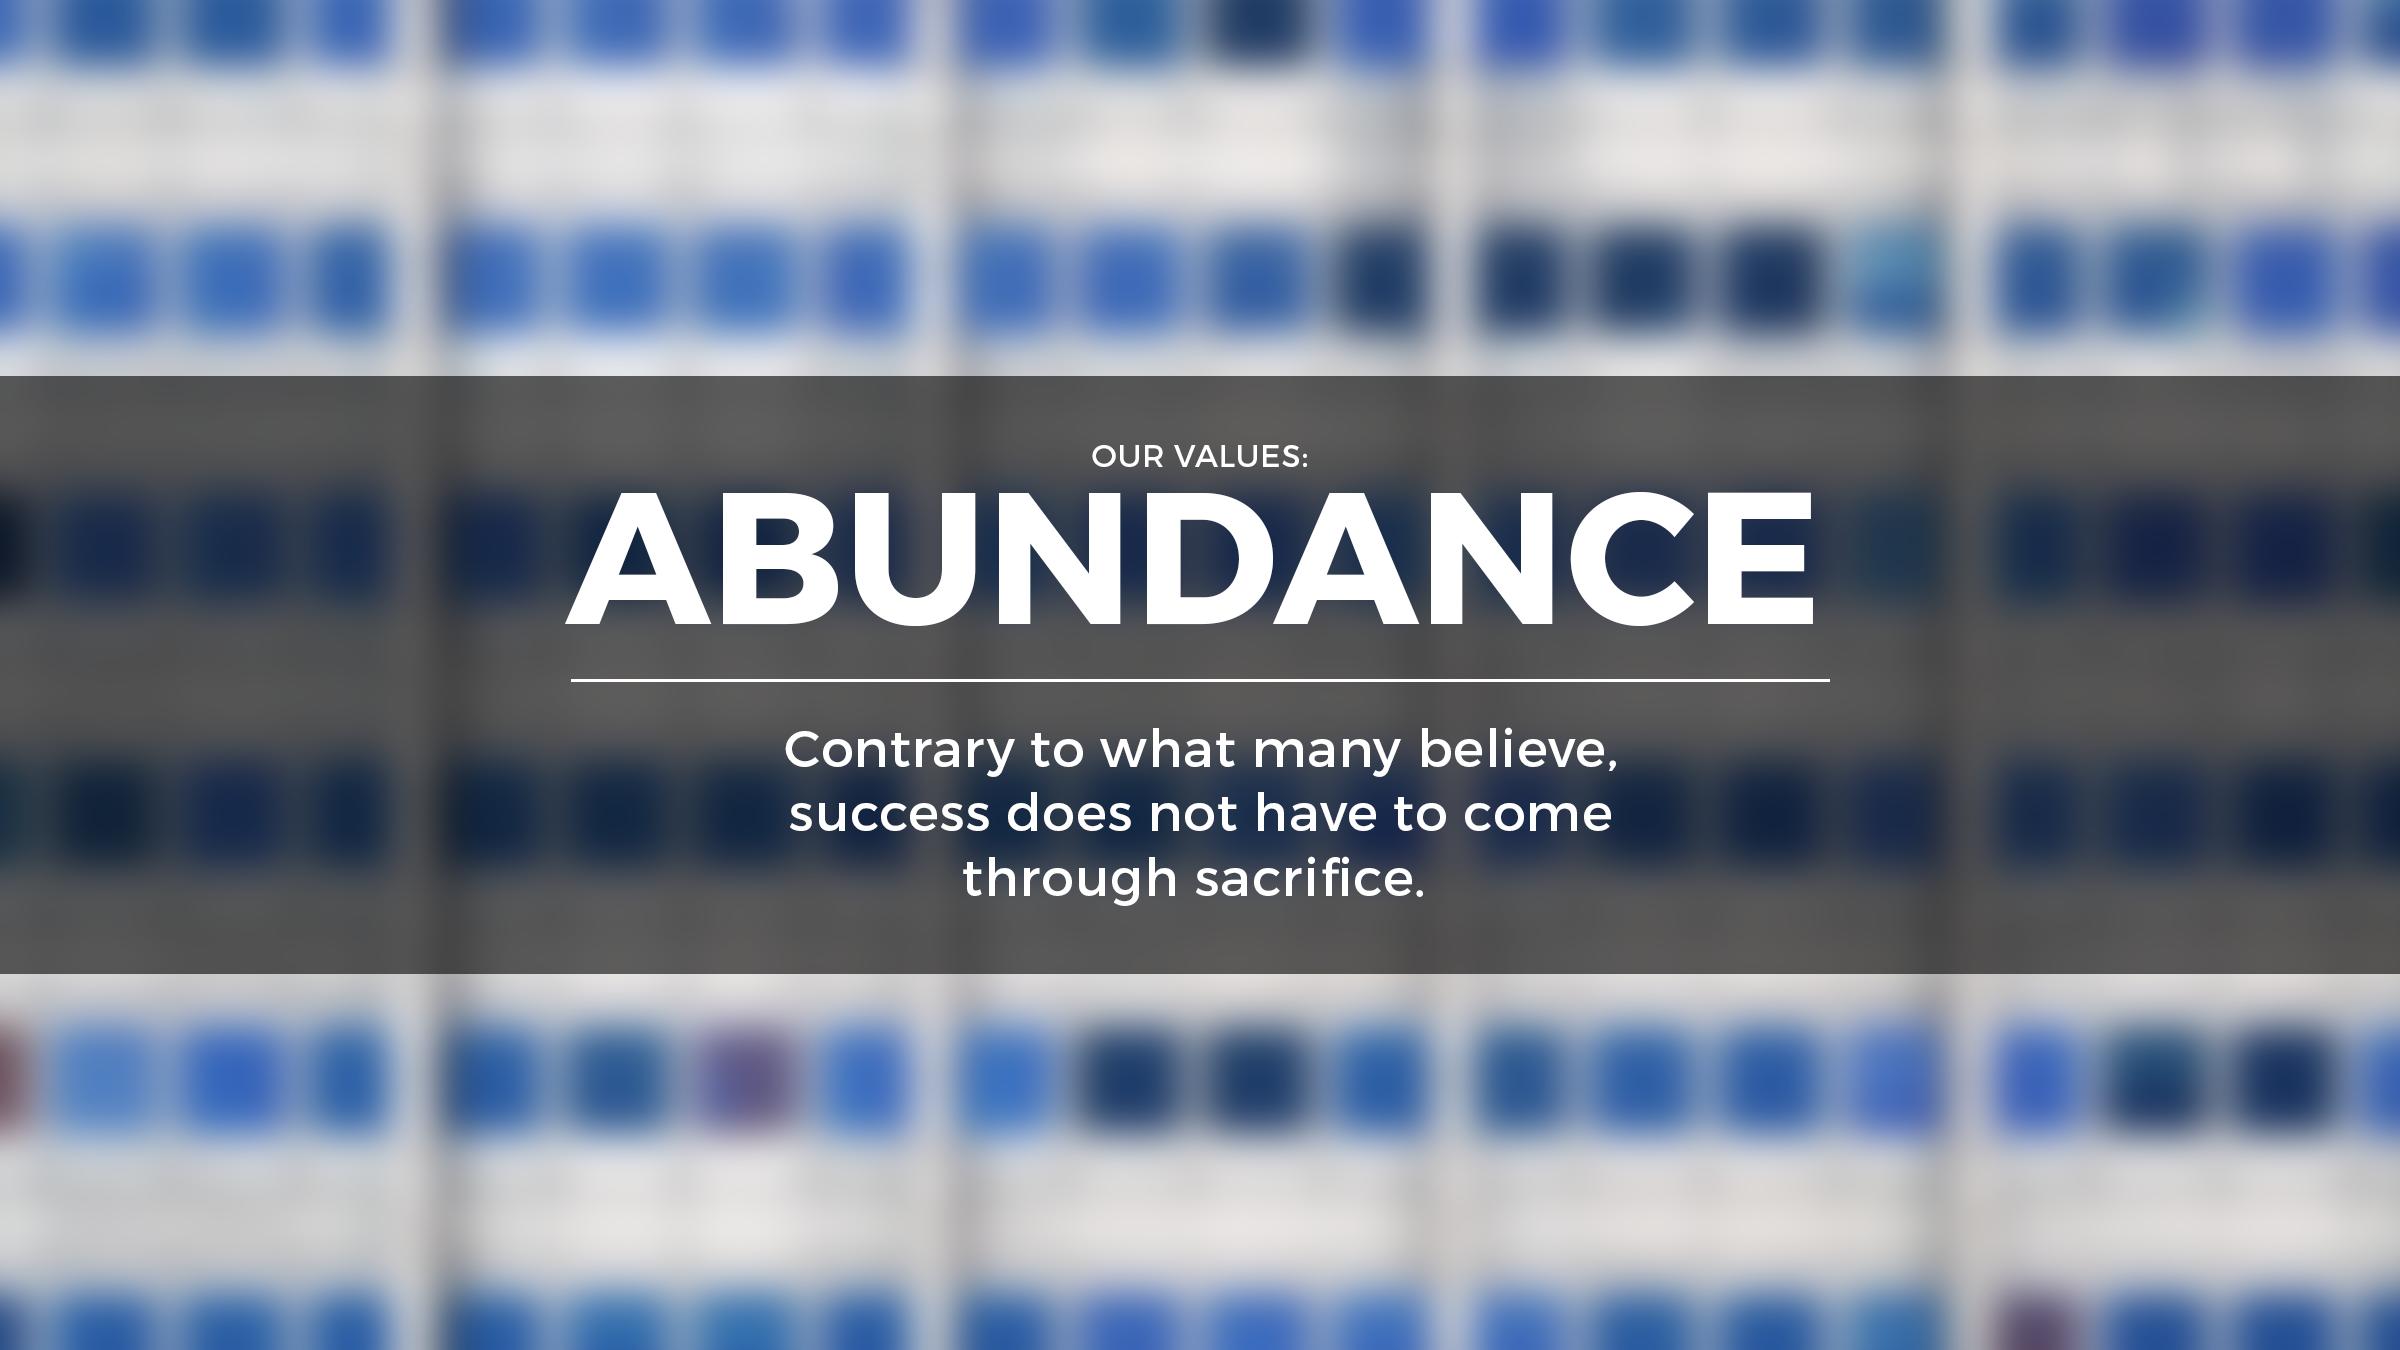 Values 4 ABUNDANCE.png